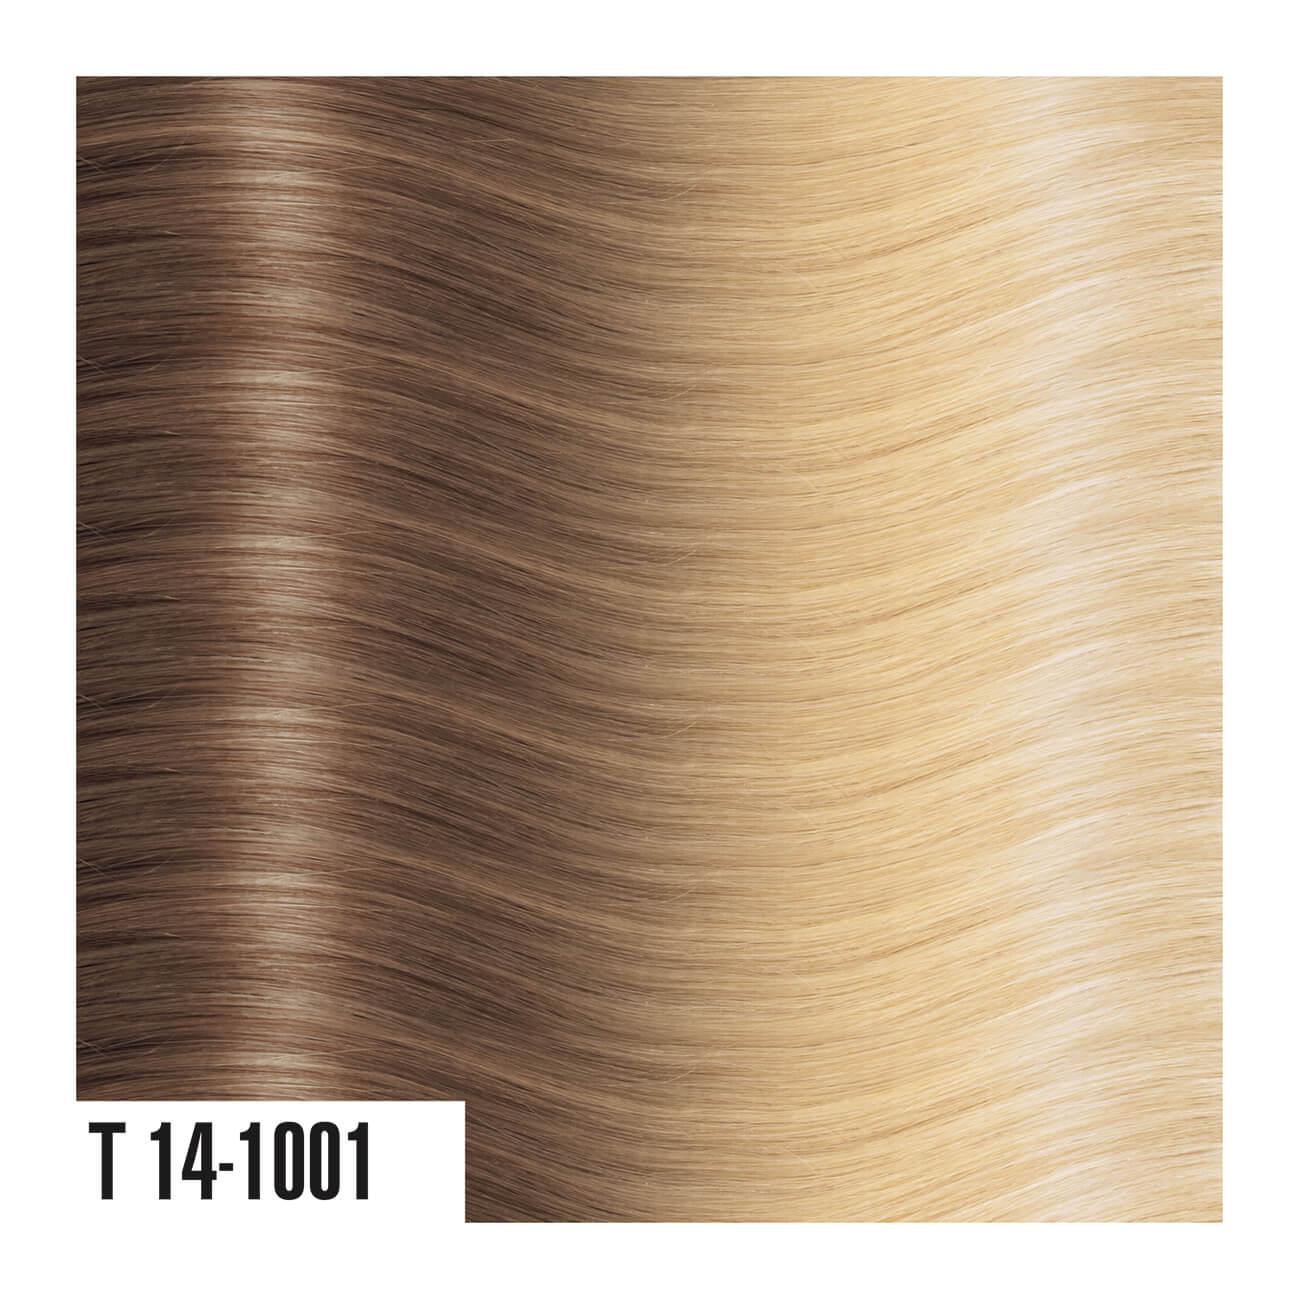 T14-1001